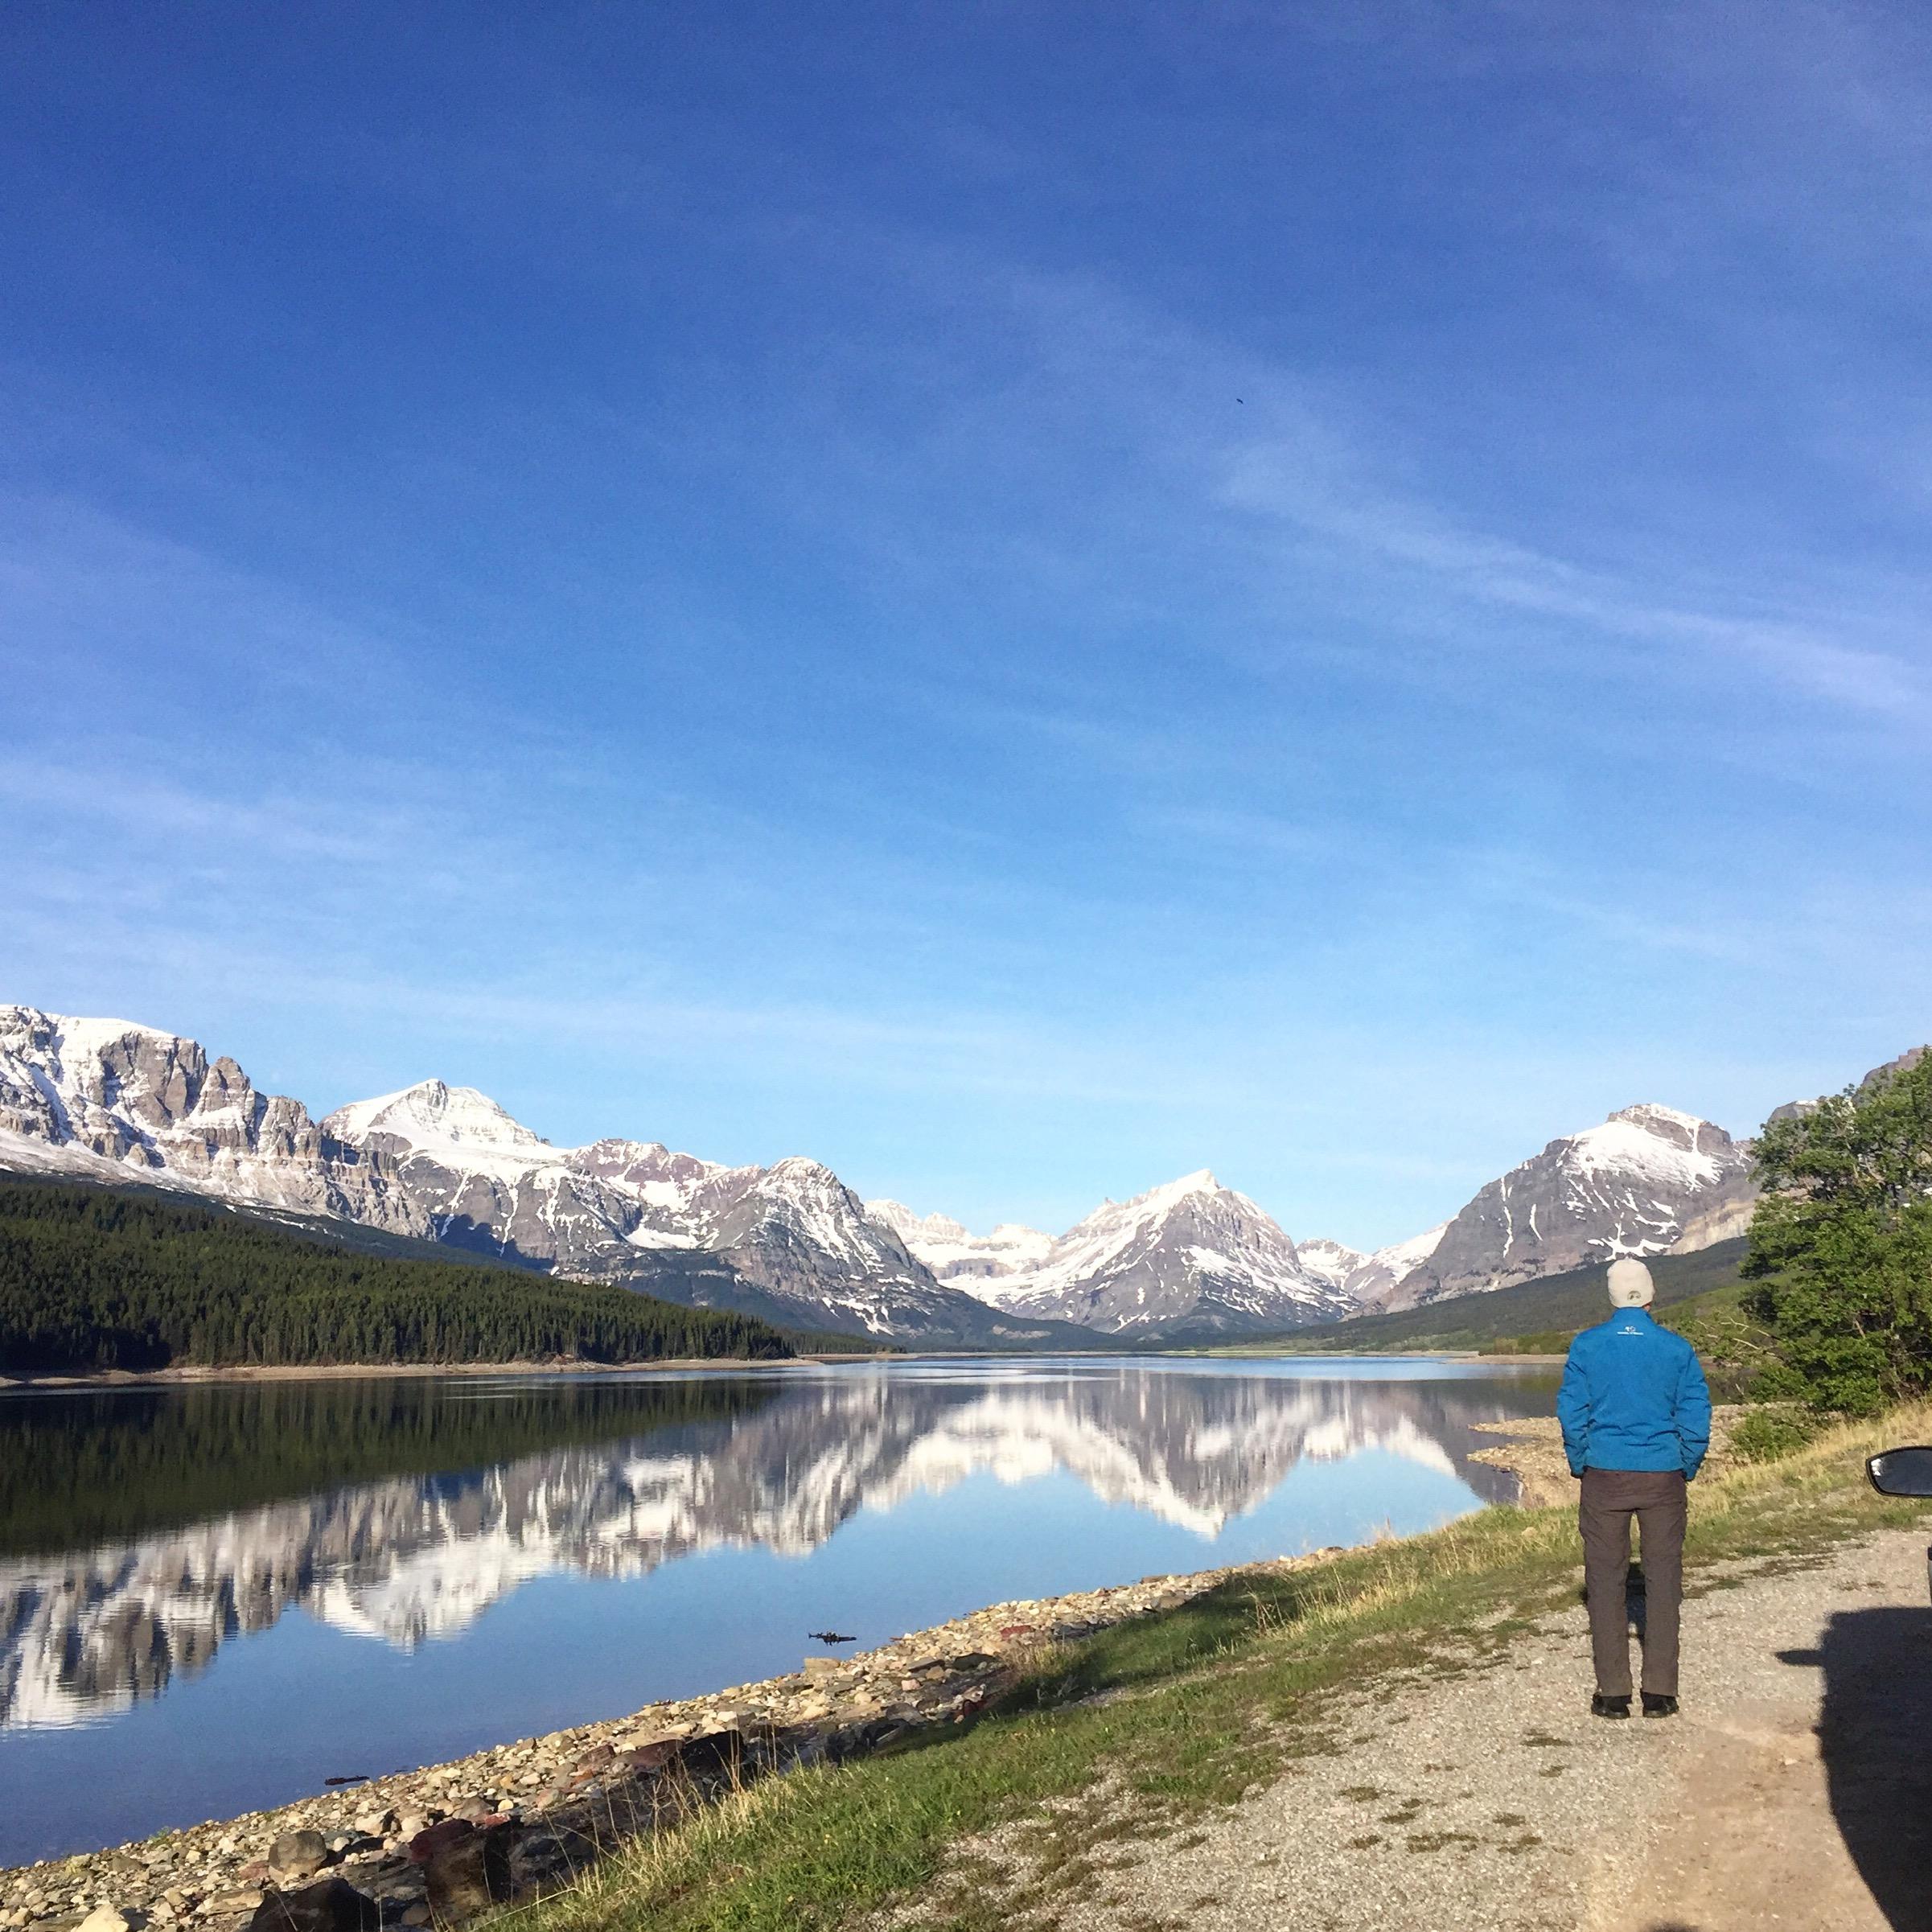 Glacier National Park Video: Ice, Ice, Baby